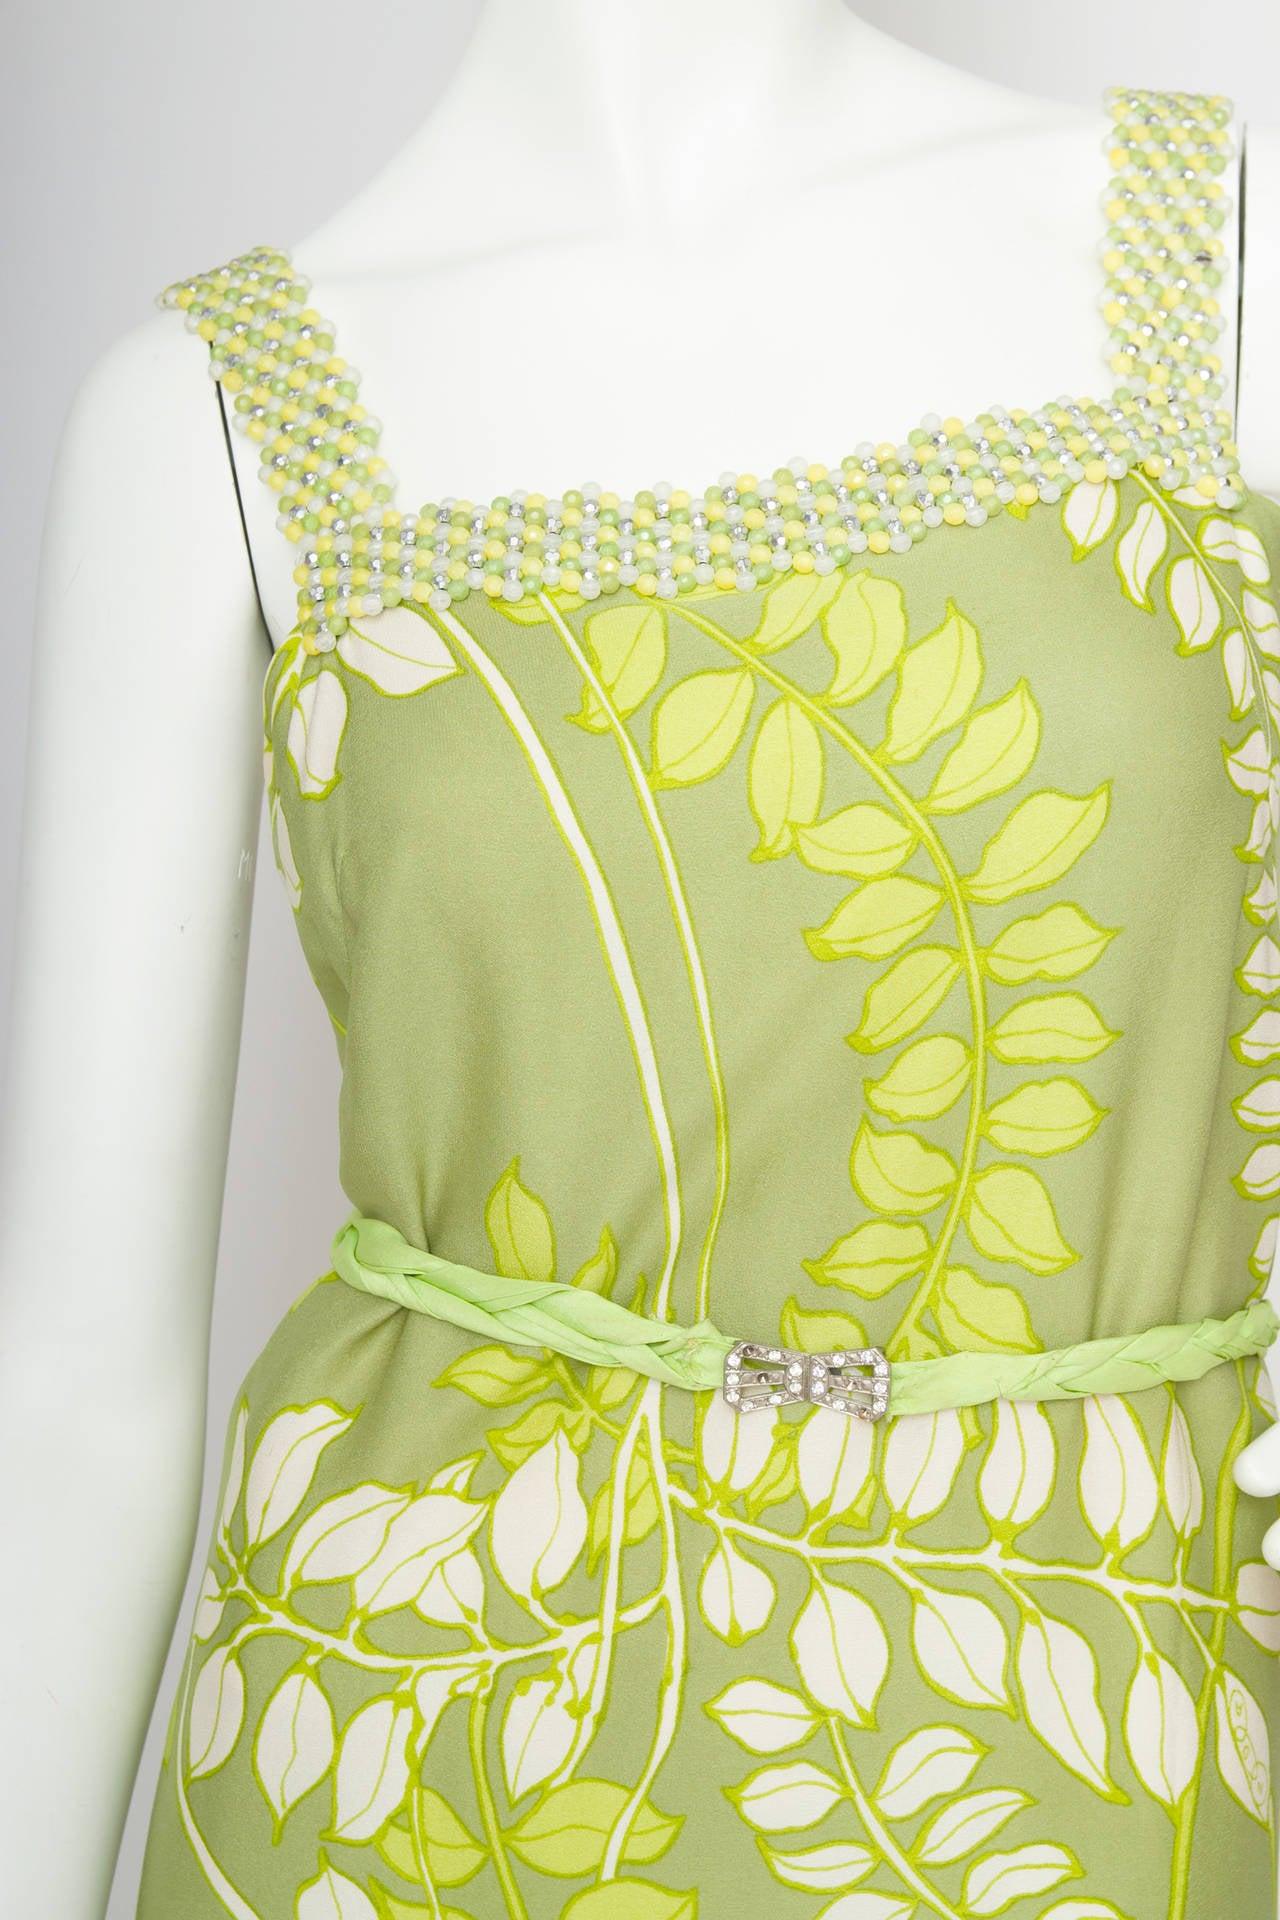 Women's 1960s Green Floral Handmade Silk Dress Size M For Sale